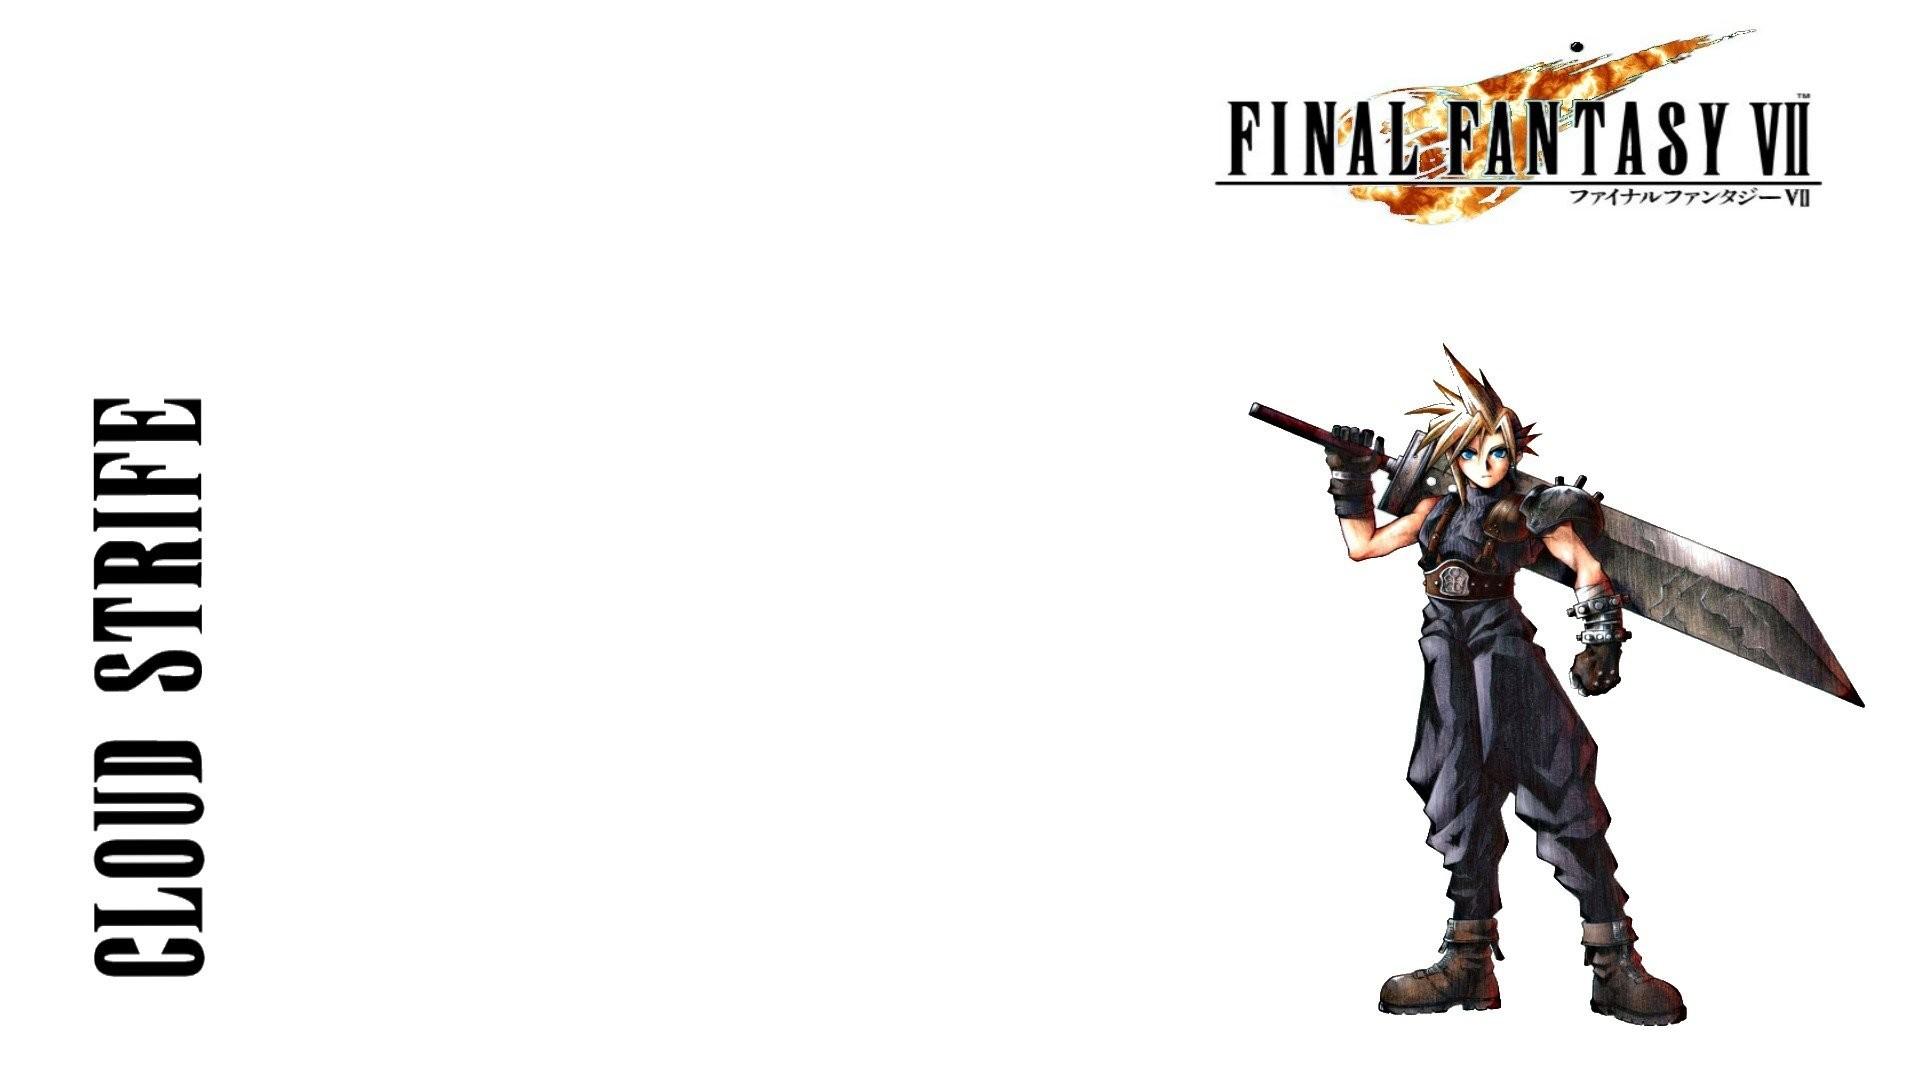 Final Fantasy VII Zack Fair Cloud Strife